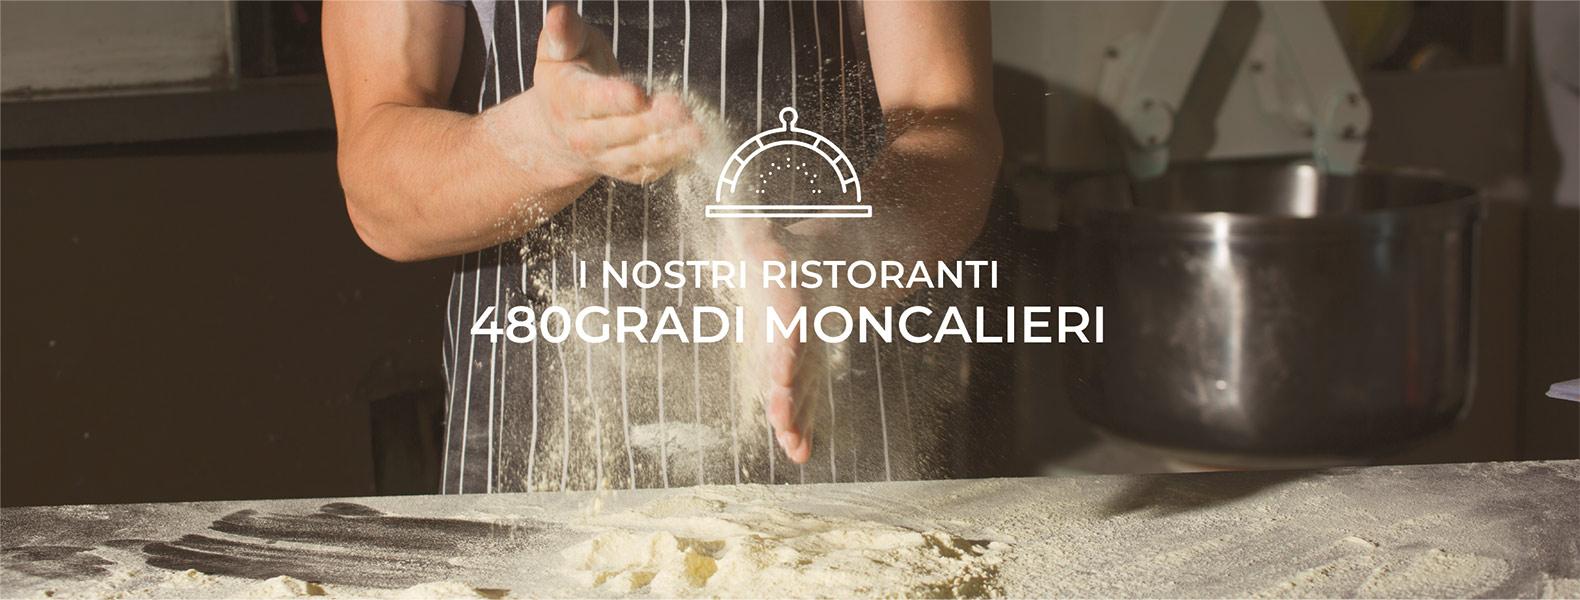 480 Gradi Pizzeria Moncalieri